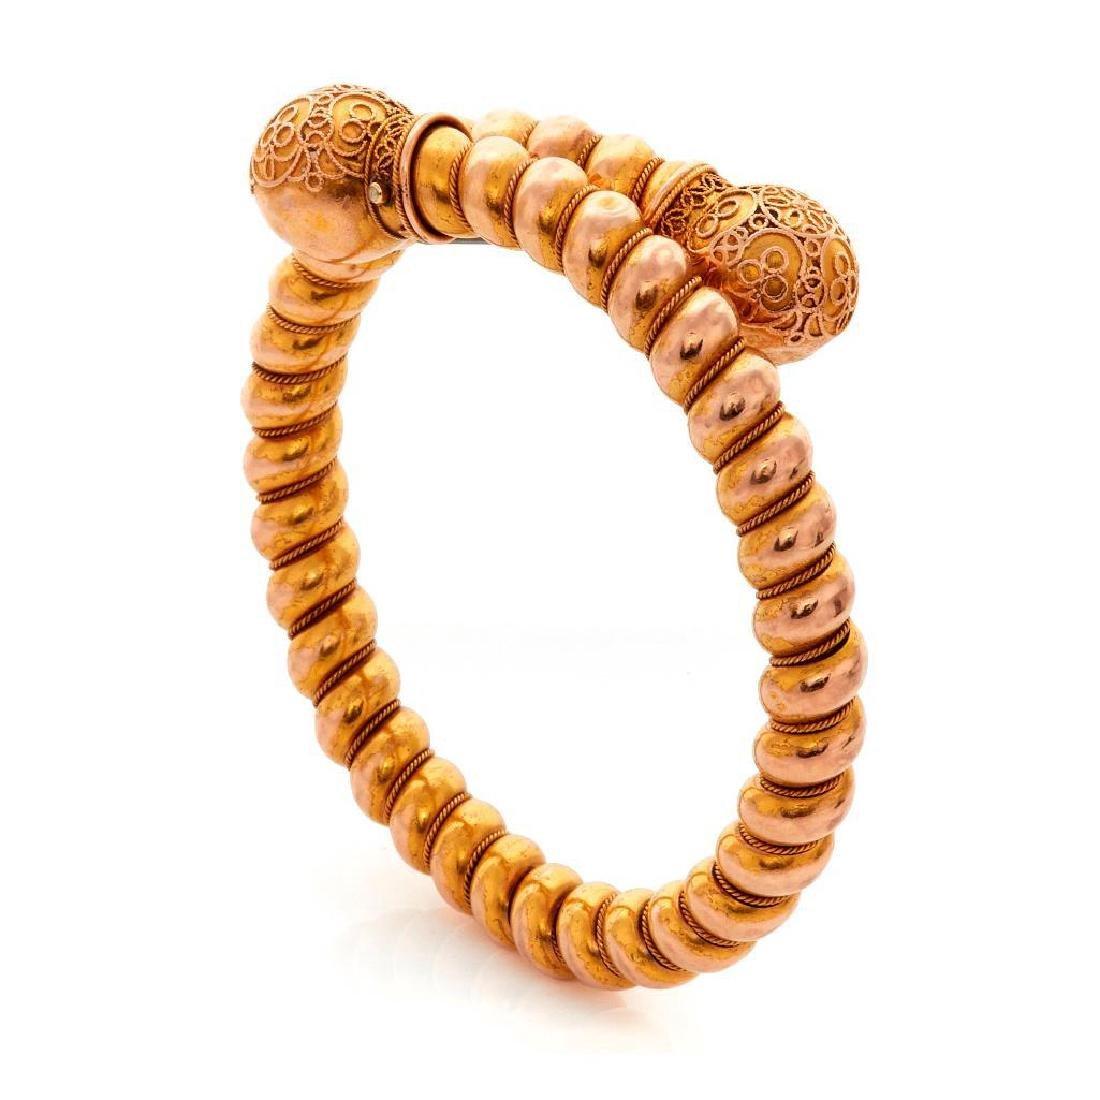 Victorian 14k gold bangle bracelet